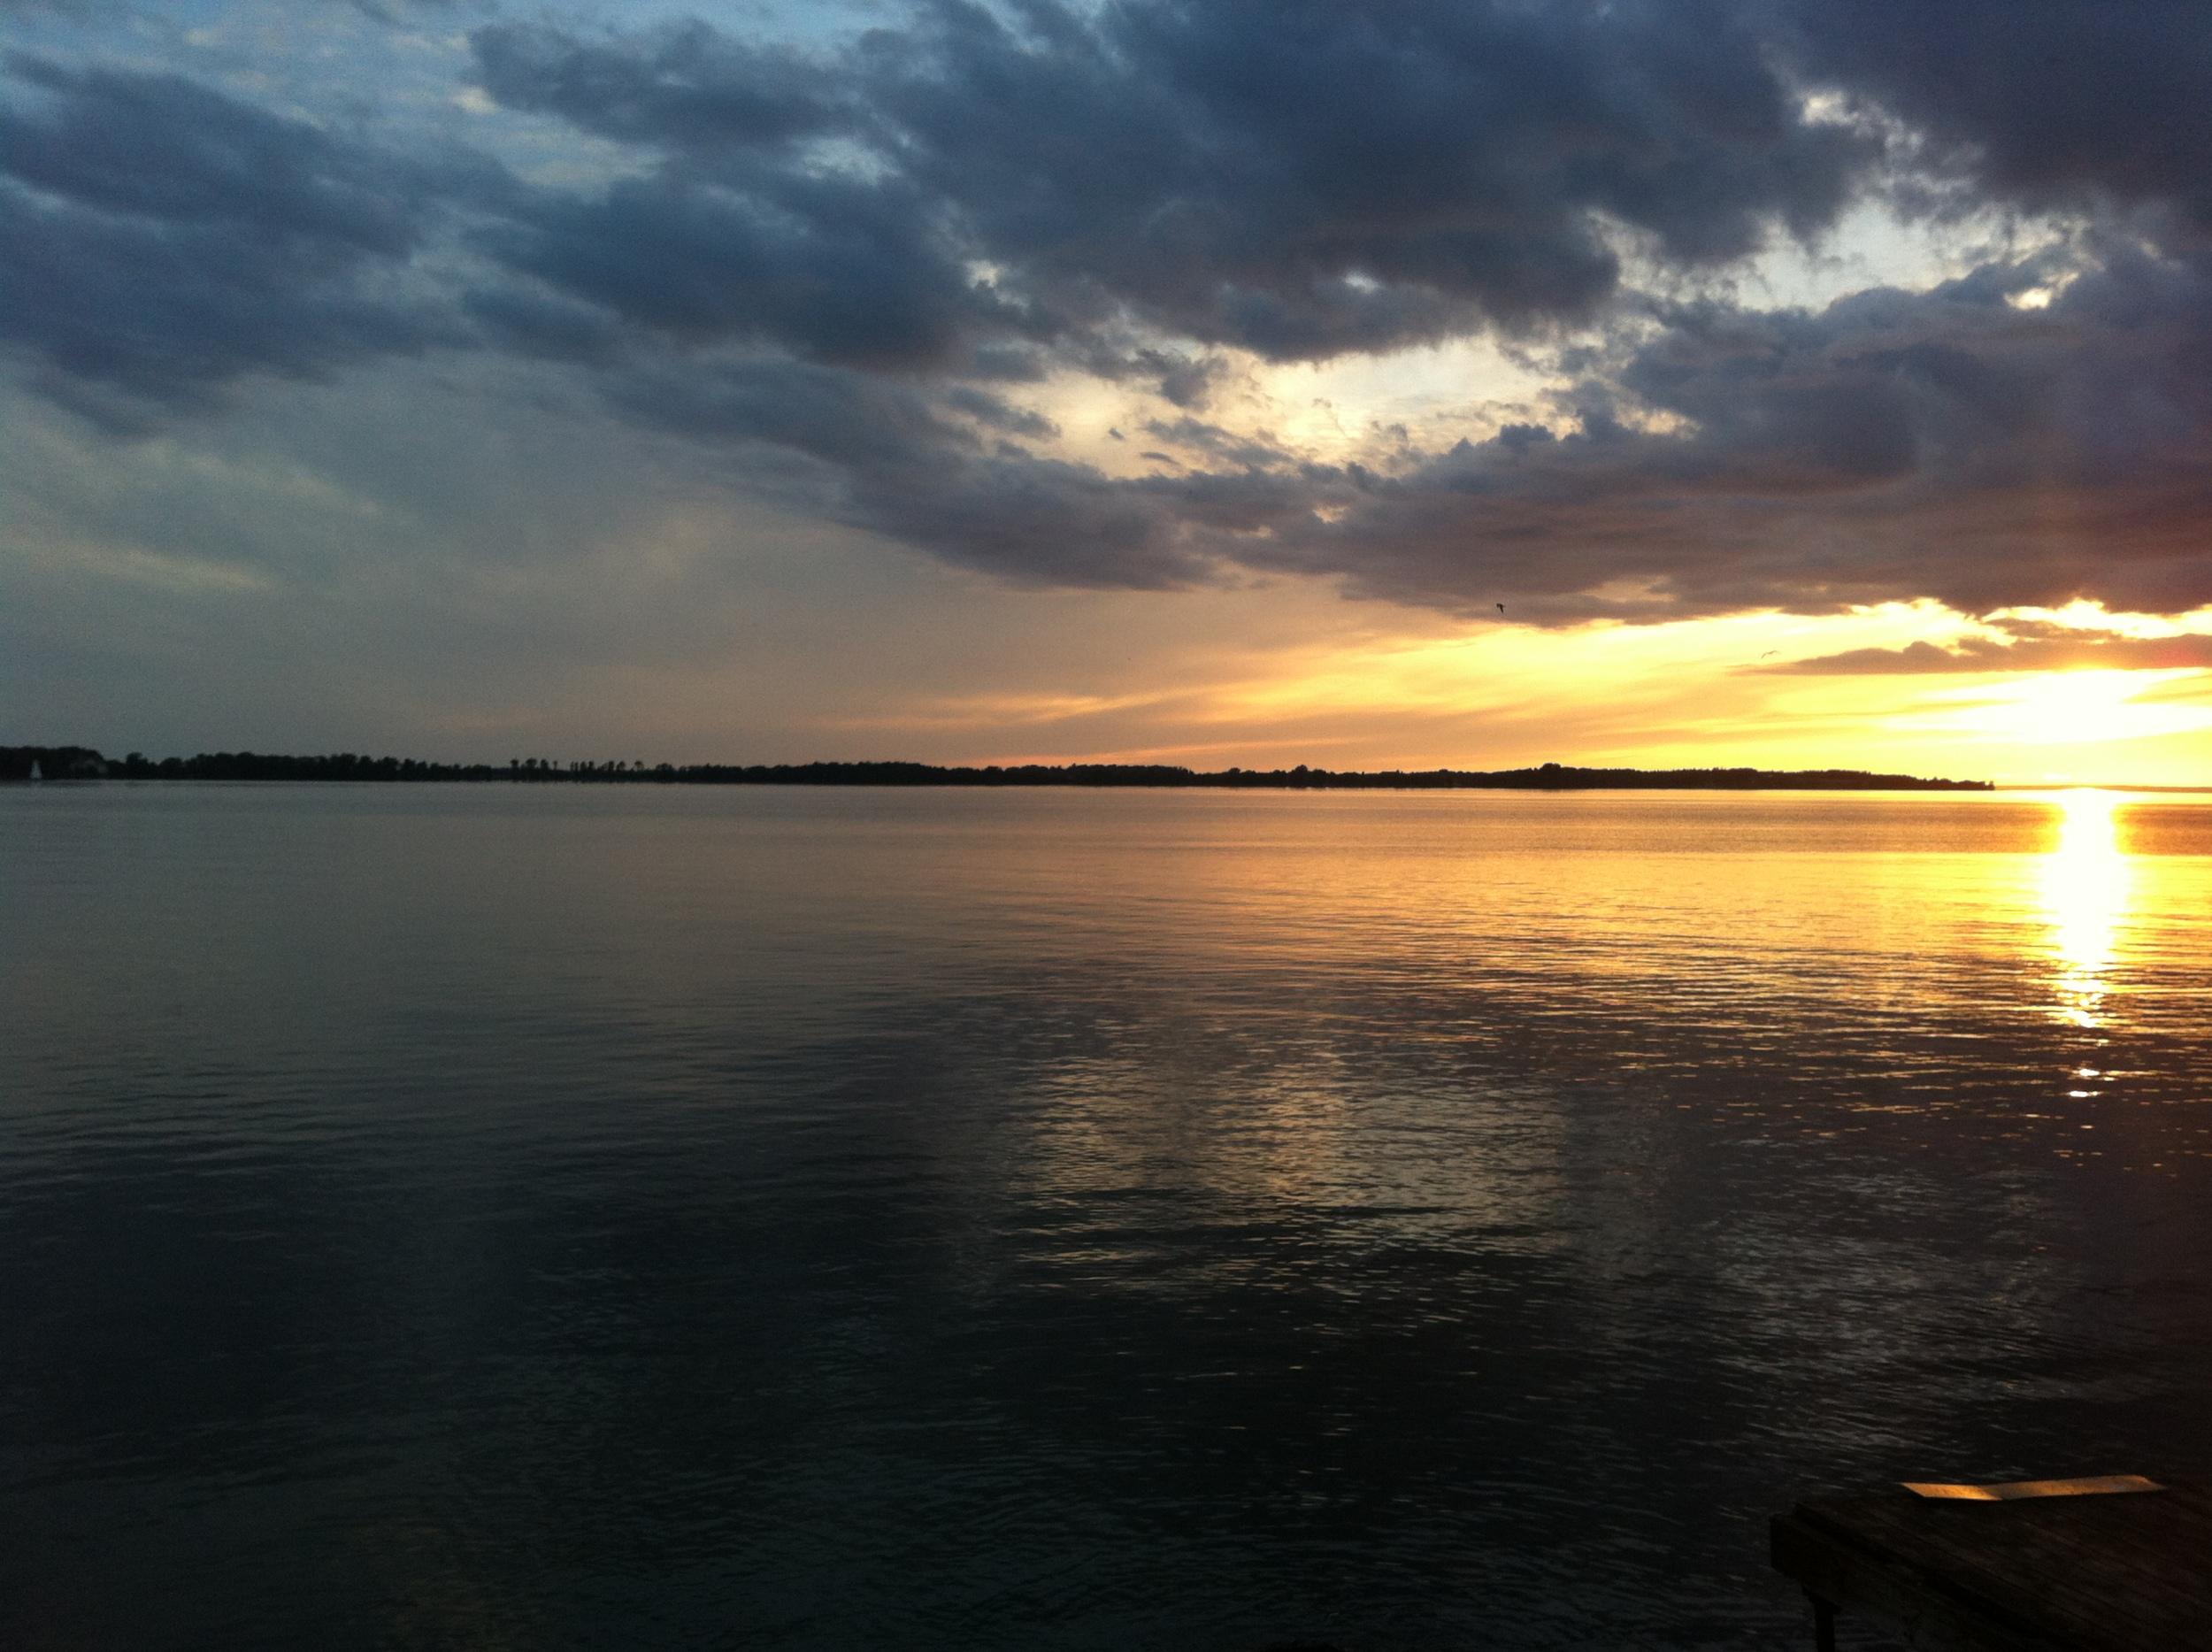 Sunset at 10:30pm